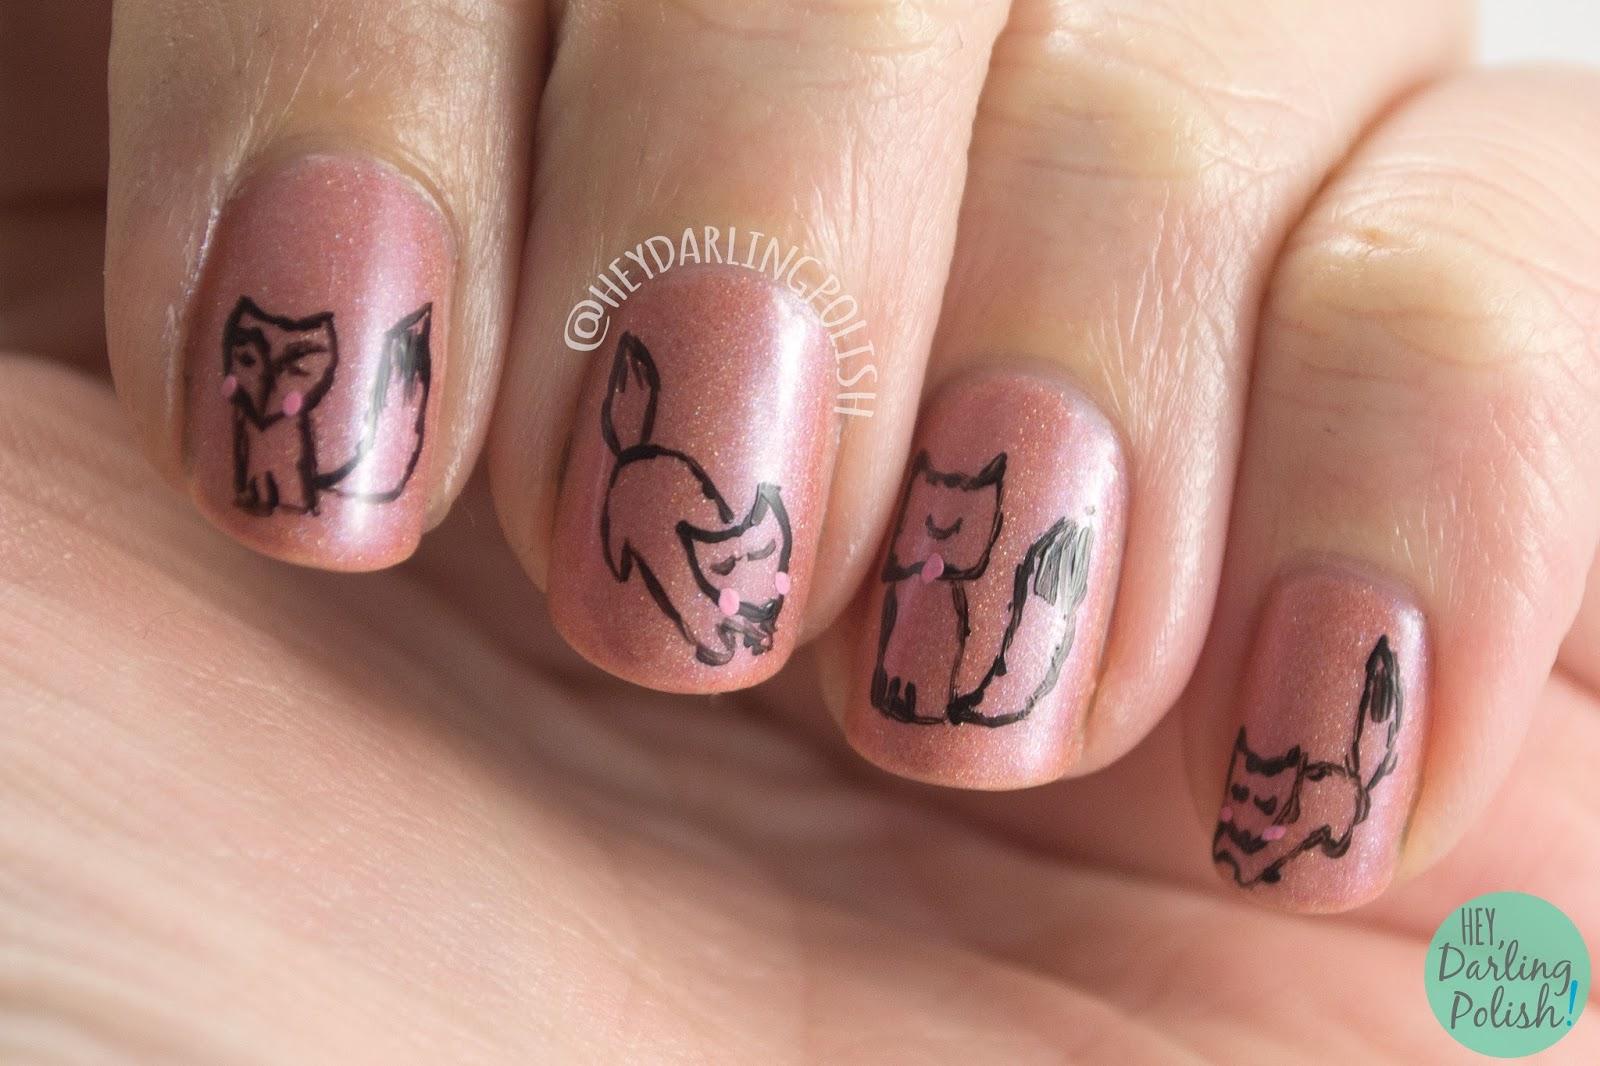 Hey, Darling Polish!: The Nail Challenge Collaborative: Animals - #1